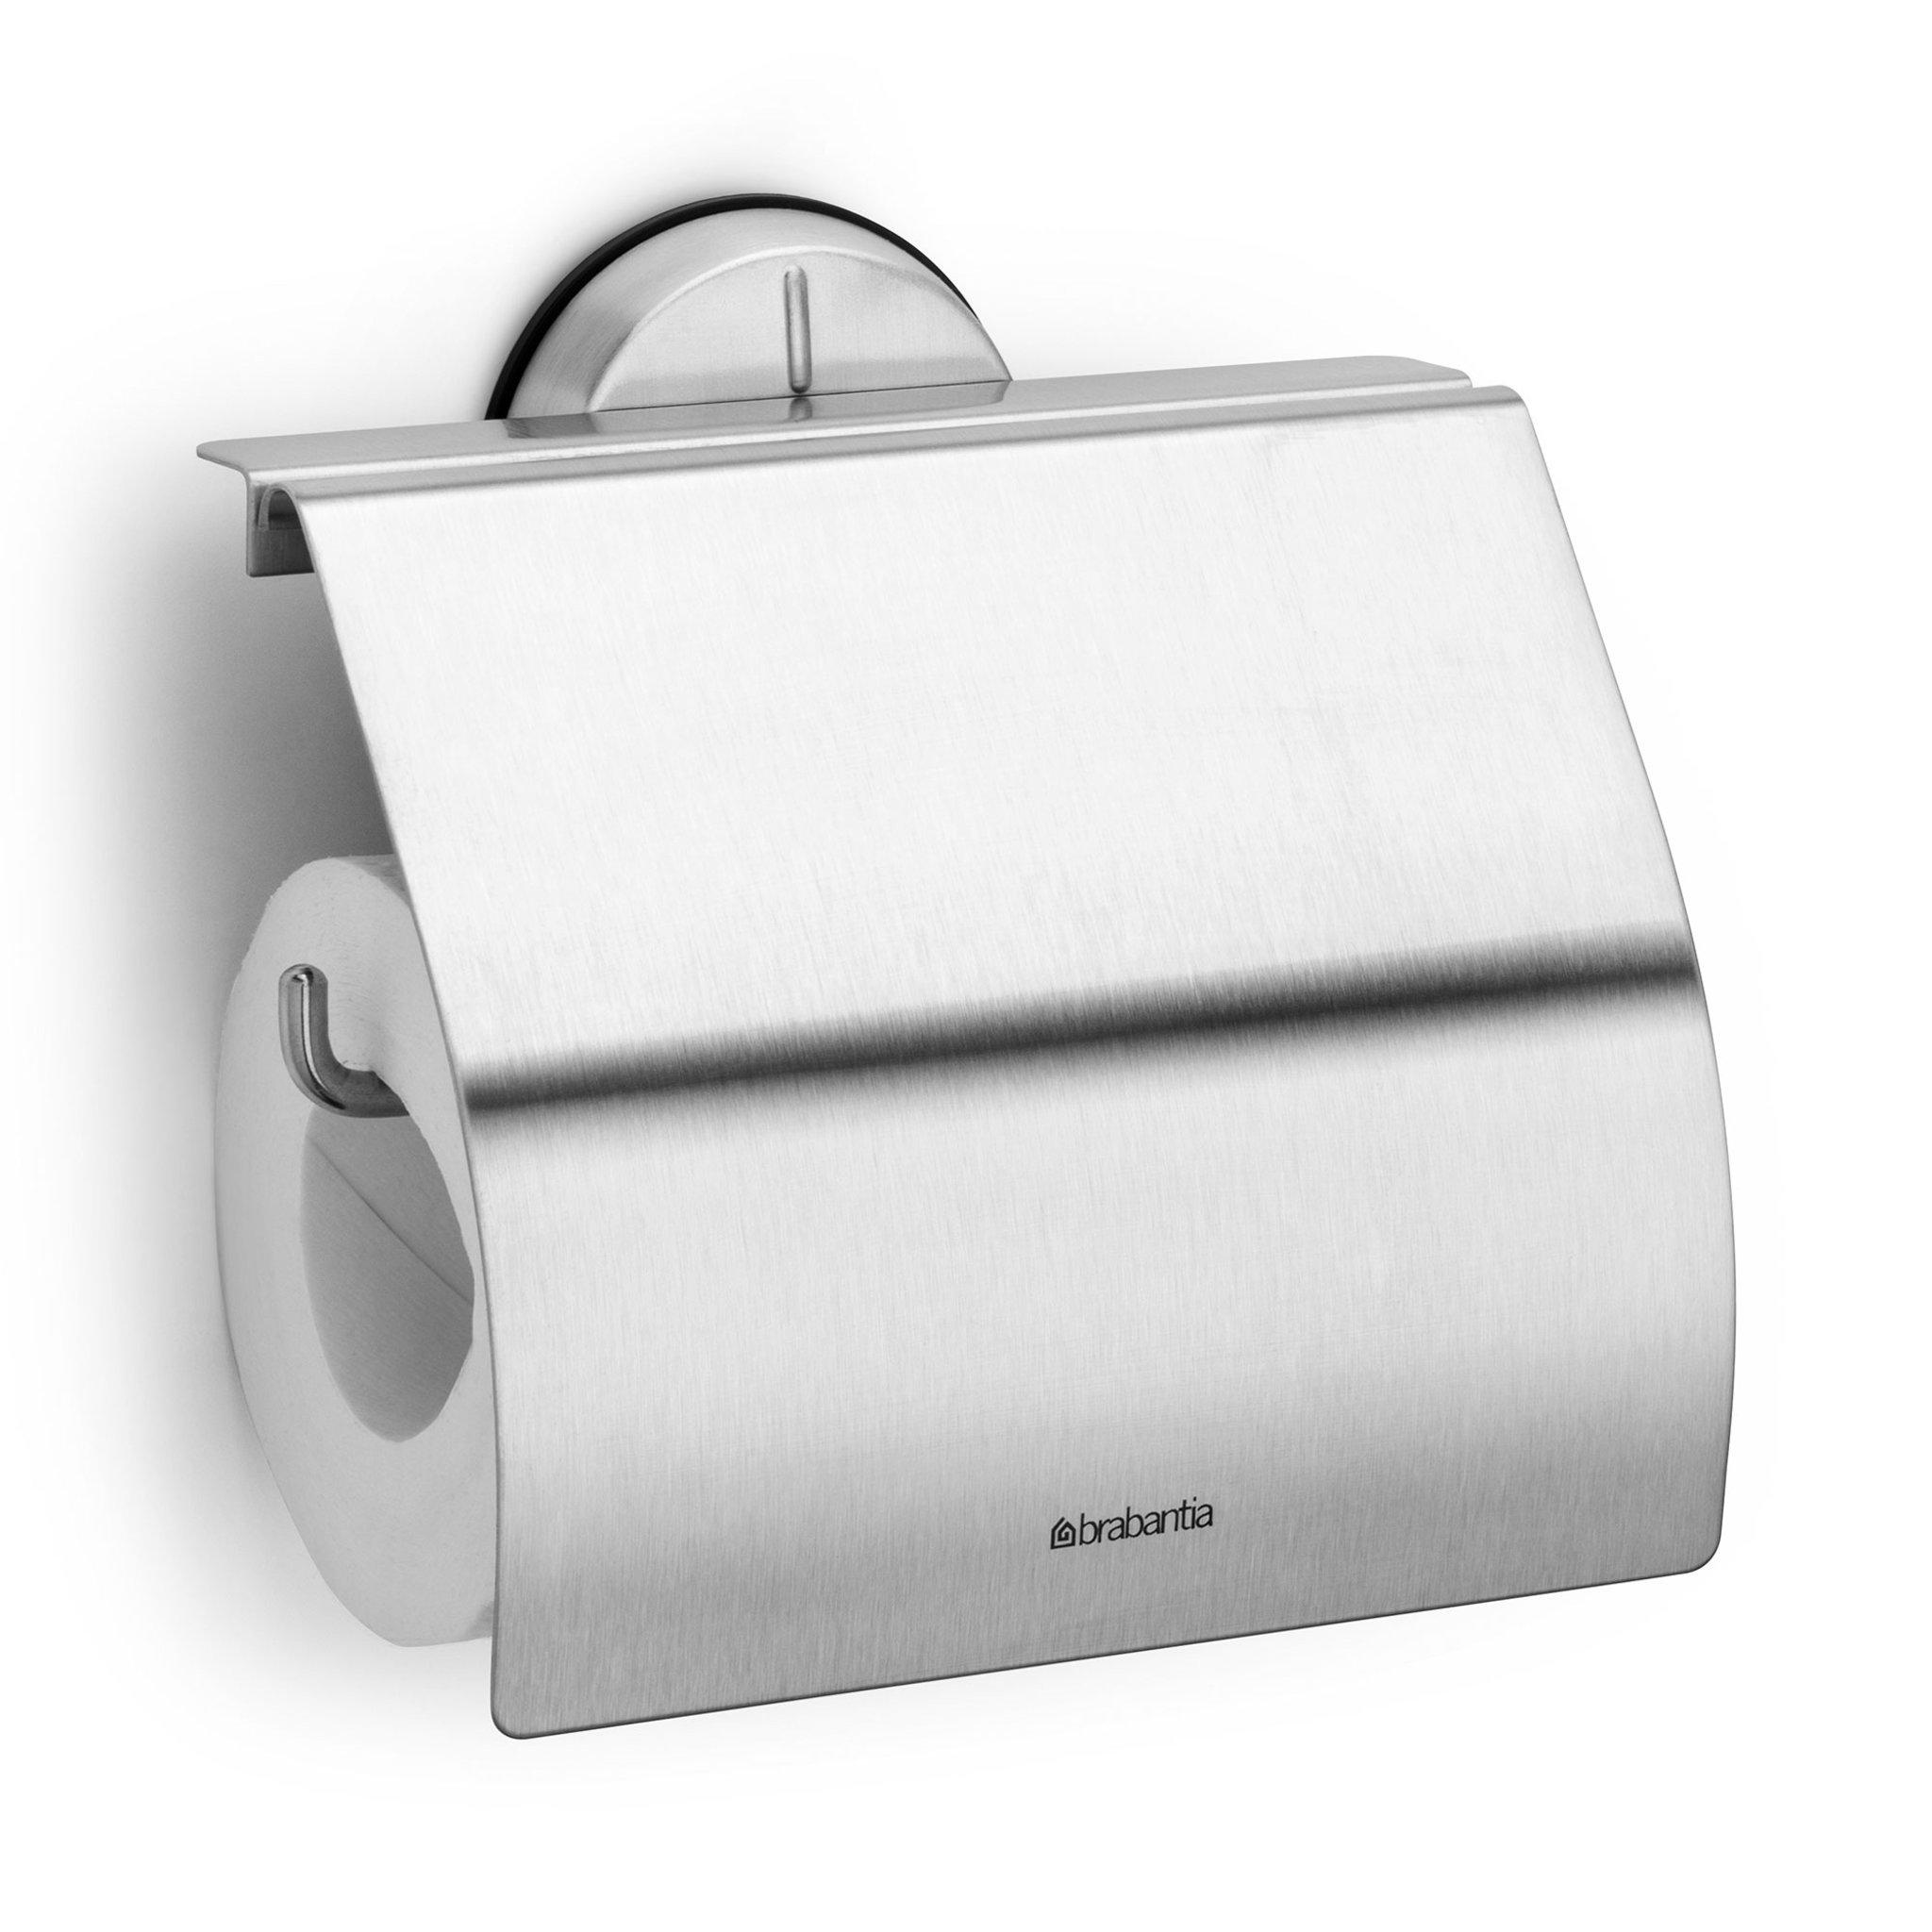 Toapappershållare profile , matt steel   badrumsaccessoarer  köp ...